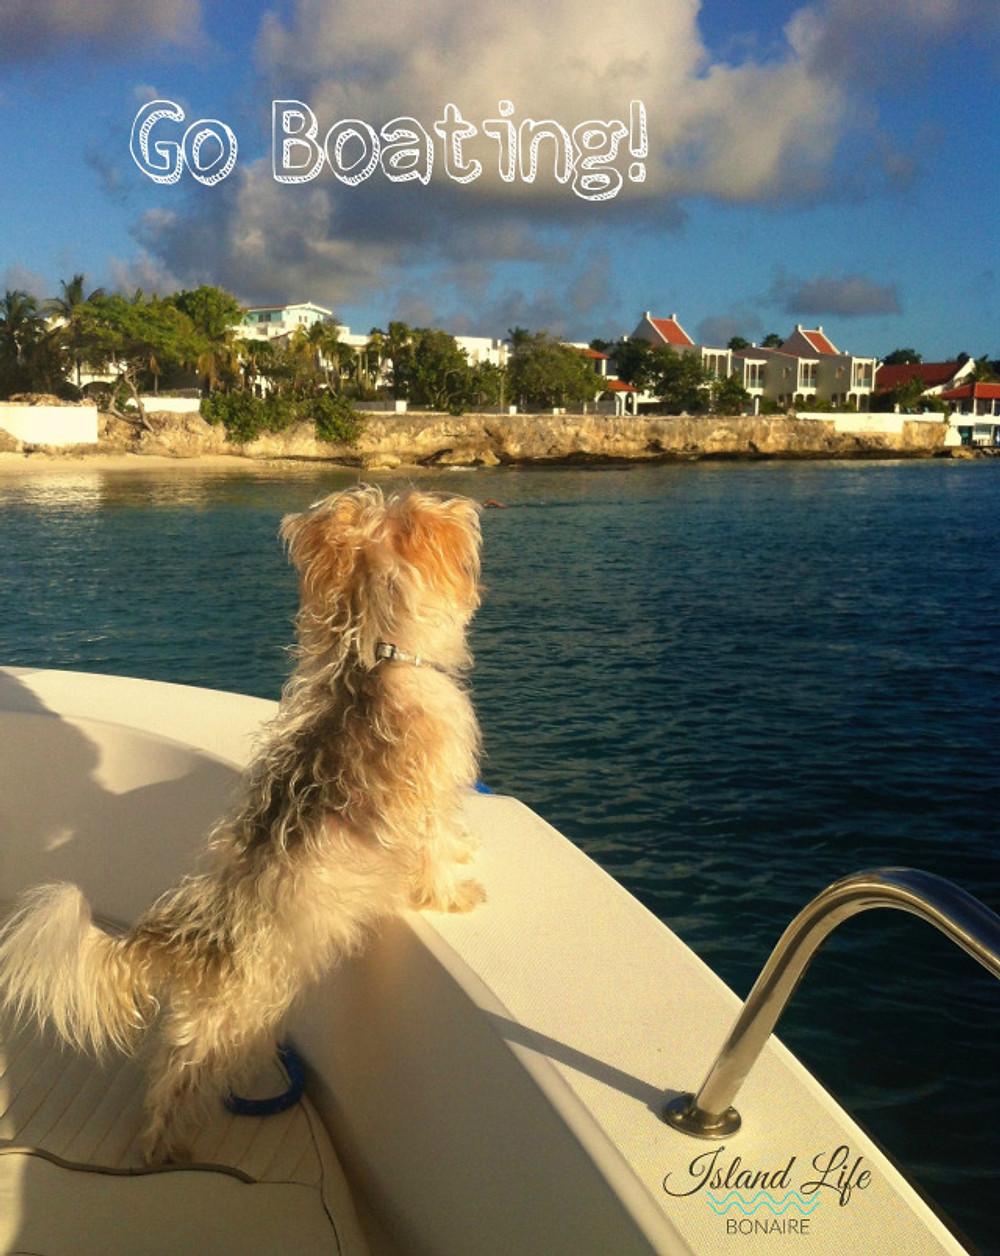 Go Boating!